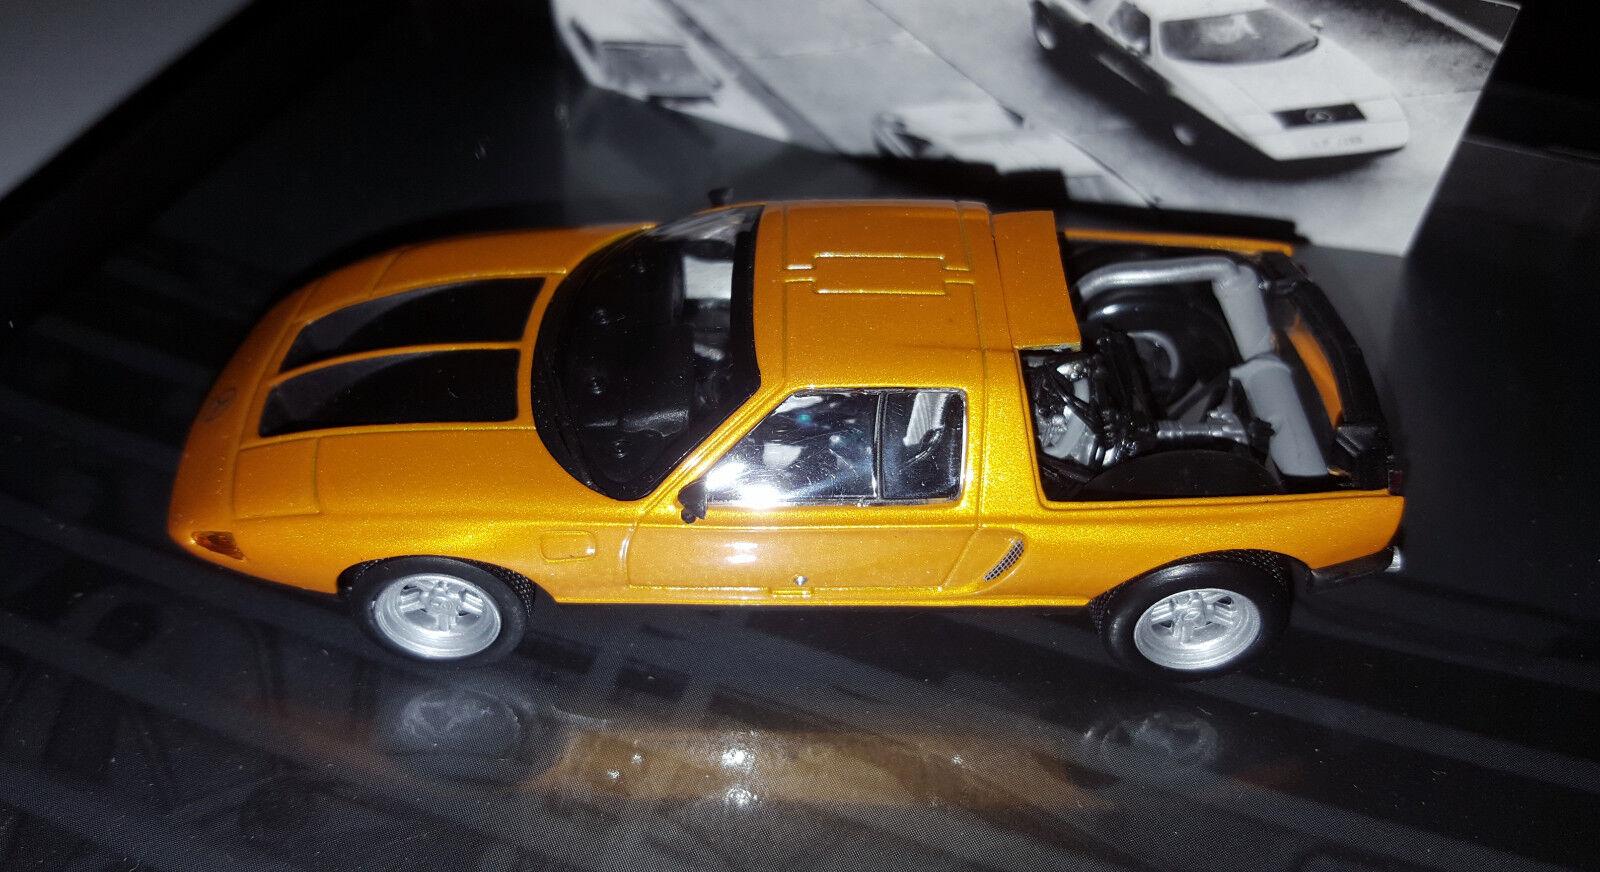 Minichamps  43 1970 Mercedes Benz C111 II in Presentation Box   9999